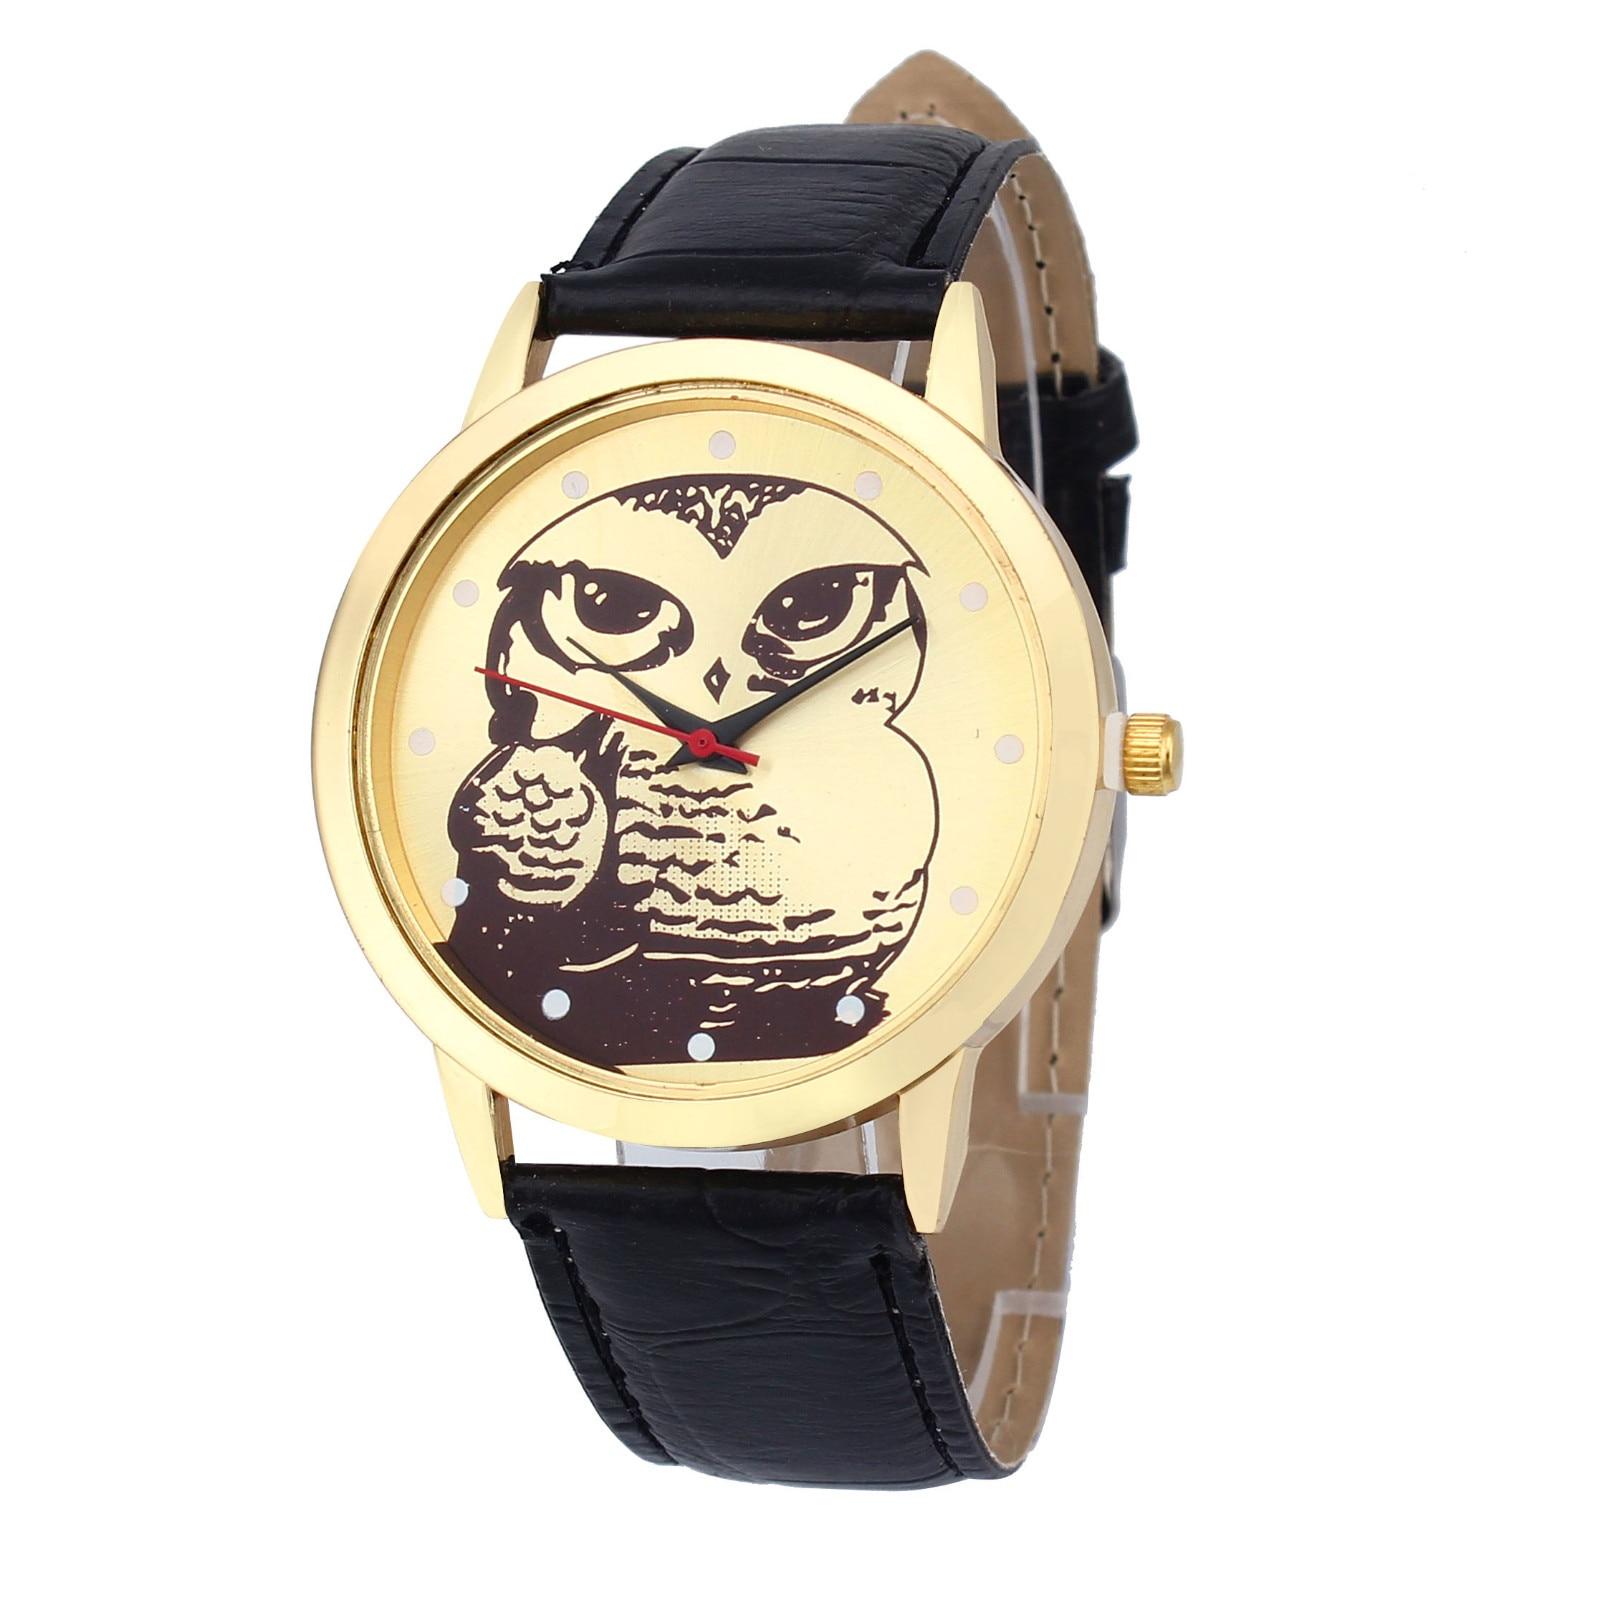 New 2019 Unisex Women Watches Men Watch Simple Classic Leather Analog Quartz Wrist Watch Fashion Men Sports Wristwatches Relogio